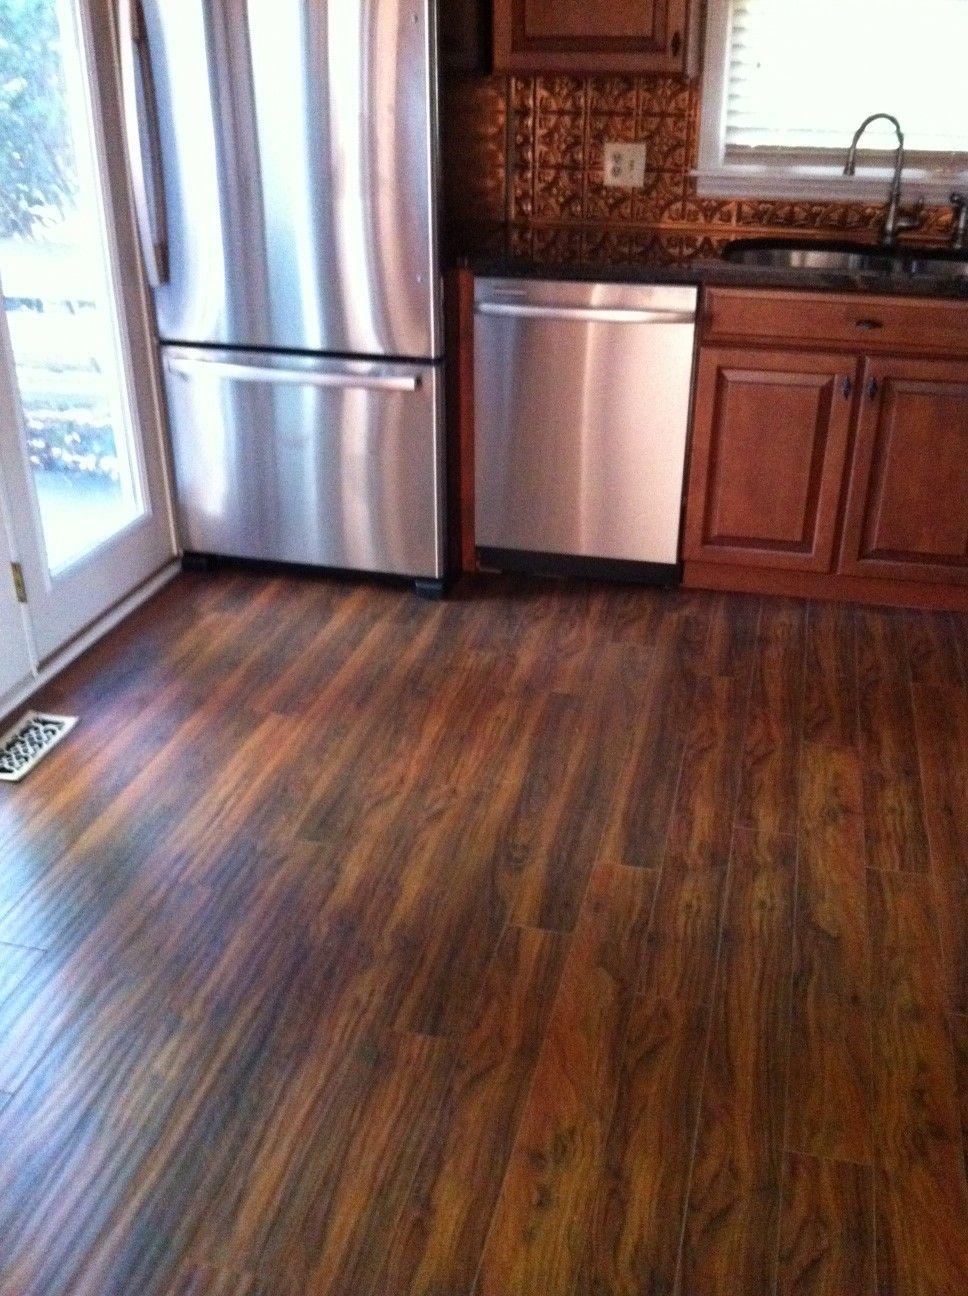 Fresco of Hardwood floor vs Laminate The Pros and Cons